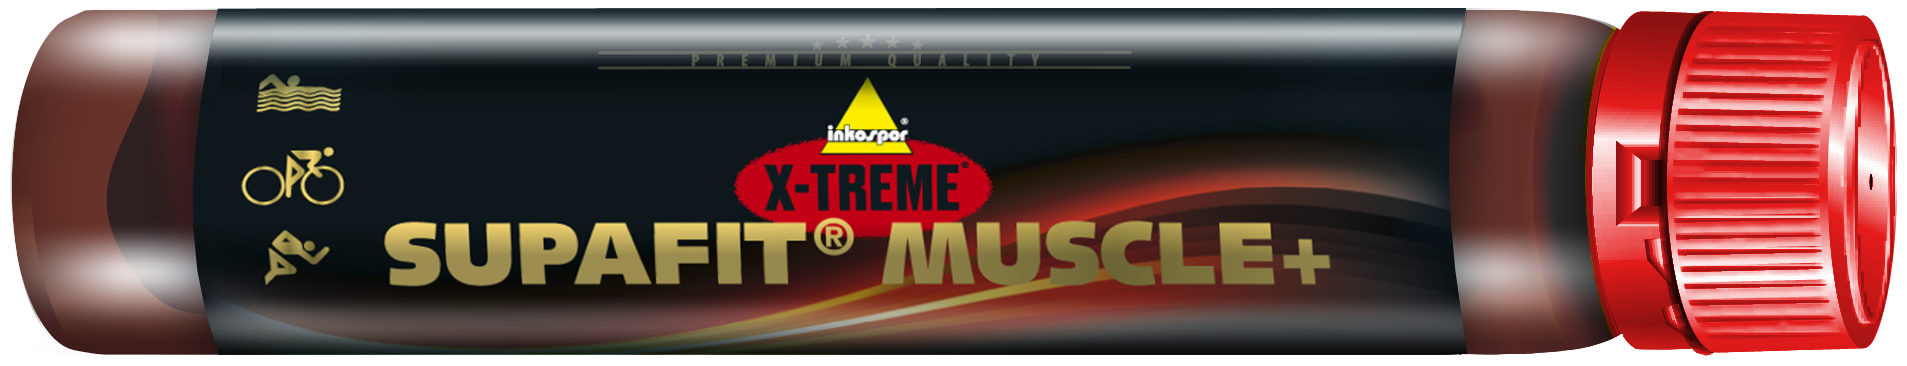 inkospor X-TREM Supafit Muscle+ Ampul